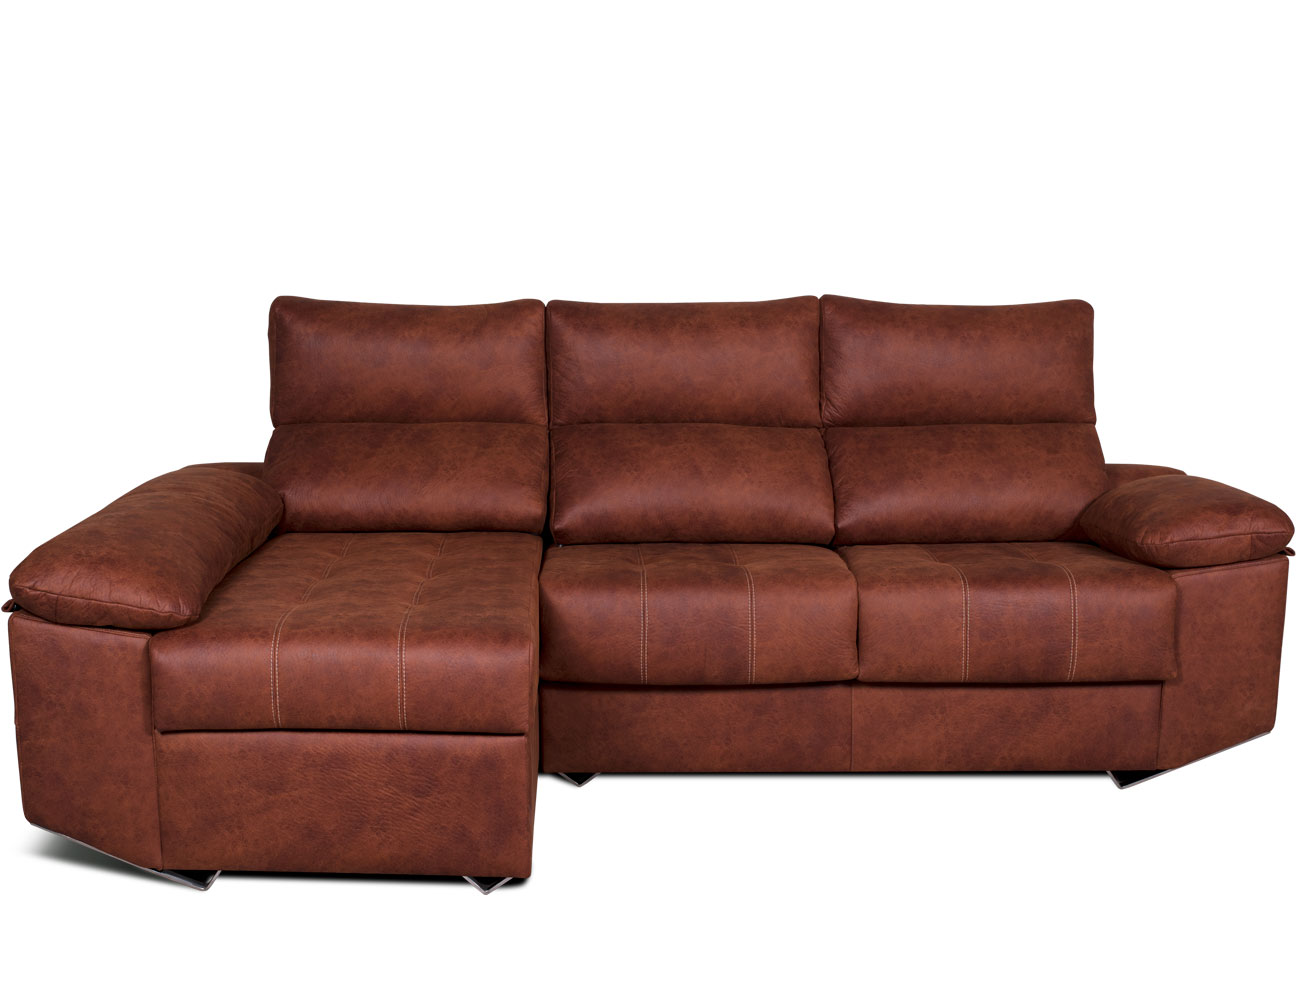 Sofa chaiselongue moderno patas forma tejido anti manchas 210